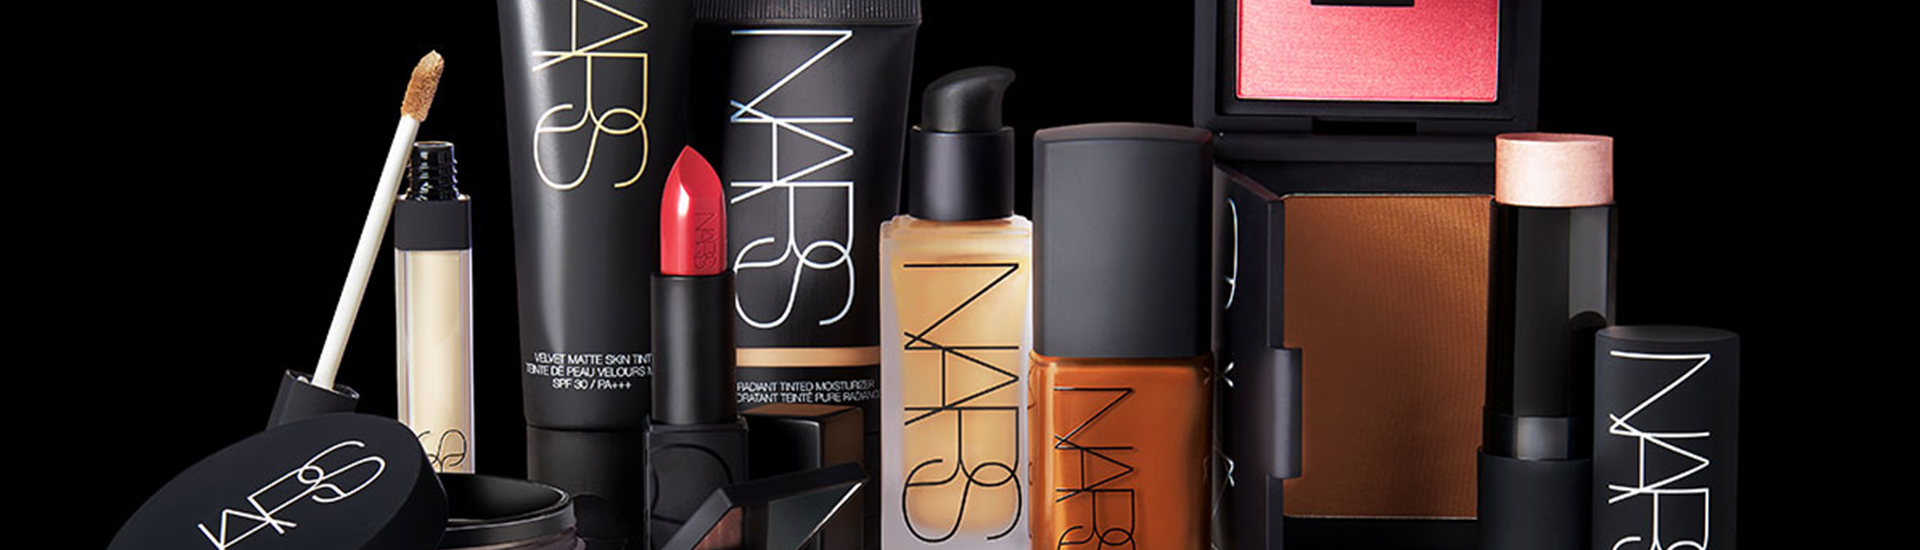 NARS Cosmetics'ten Alışveriş